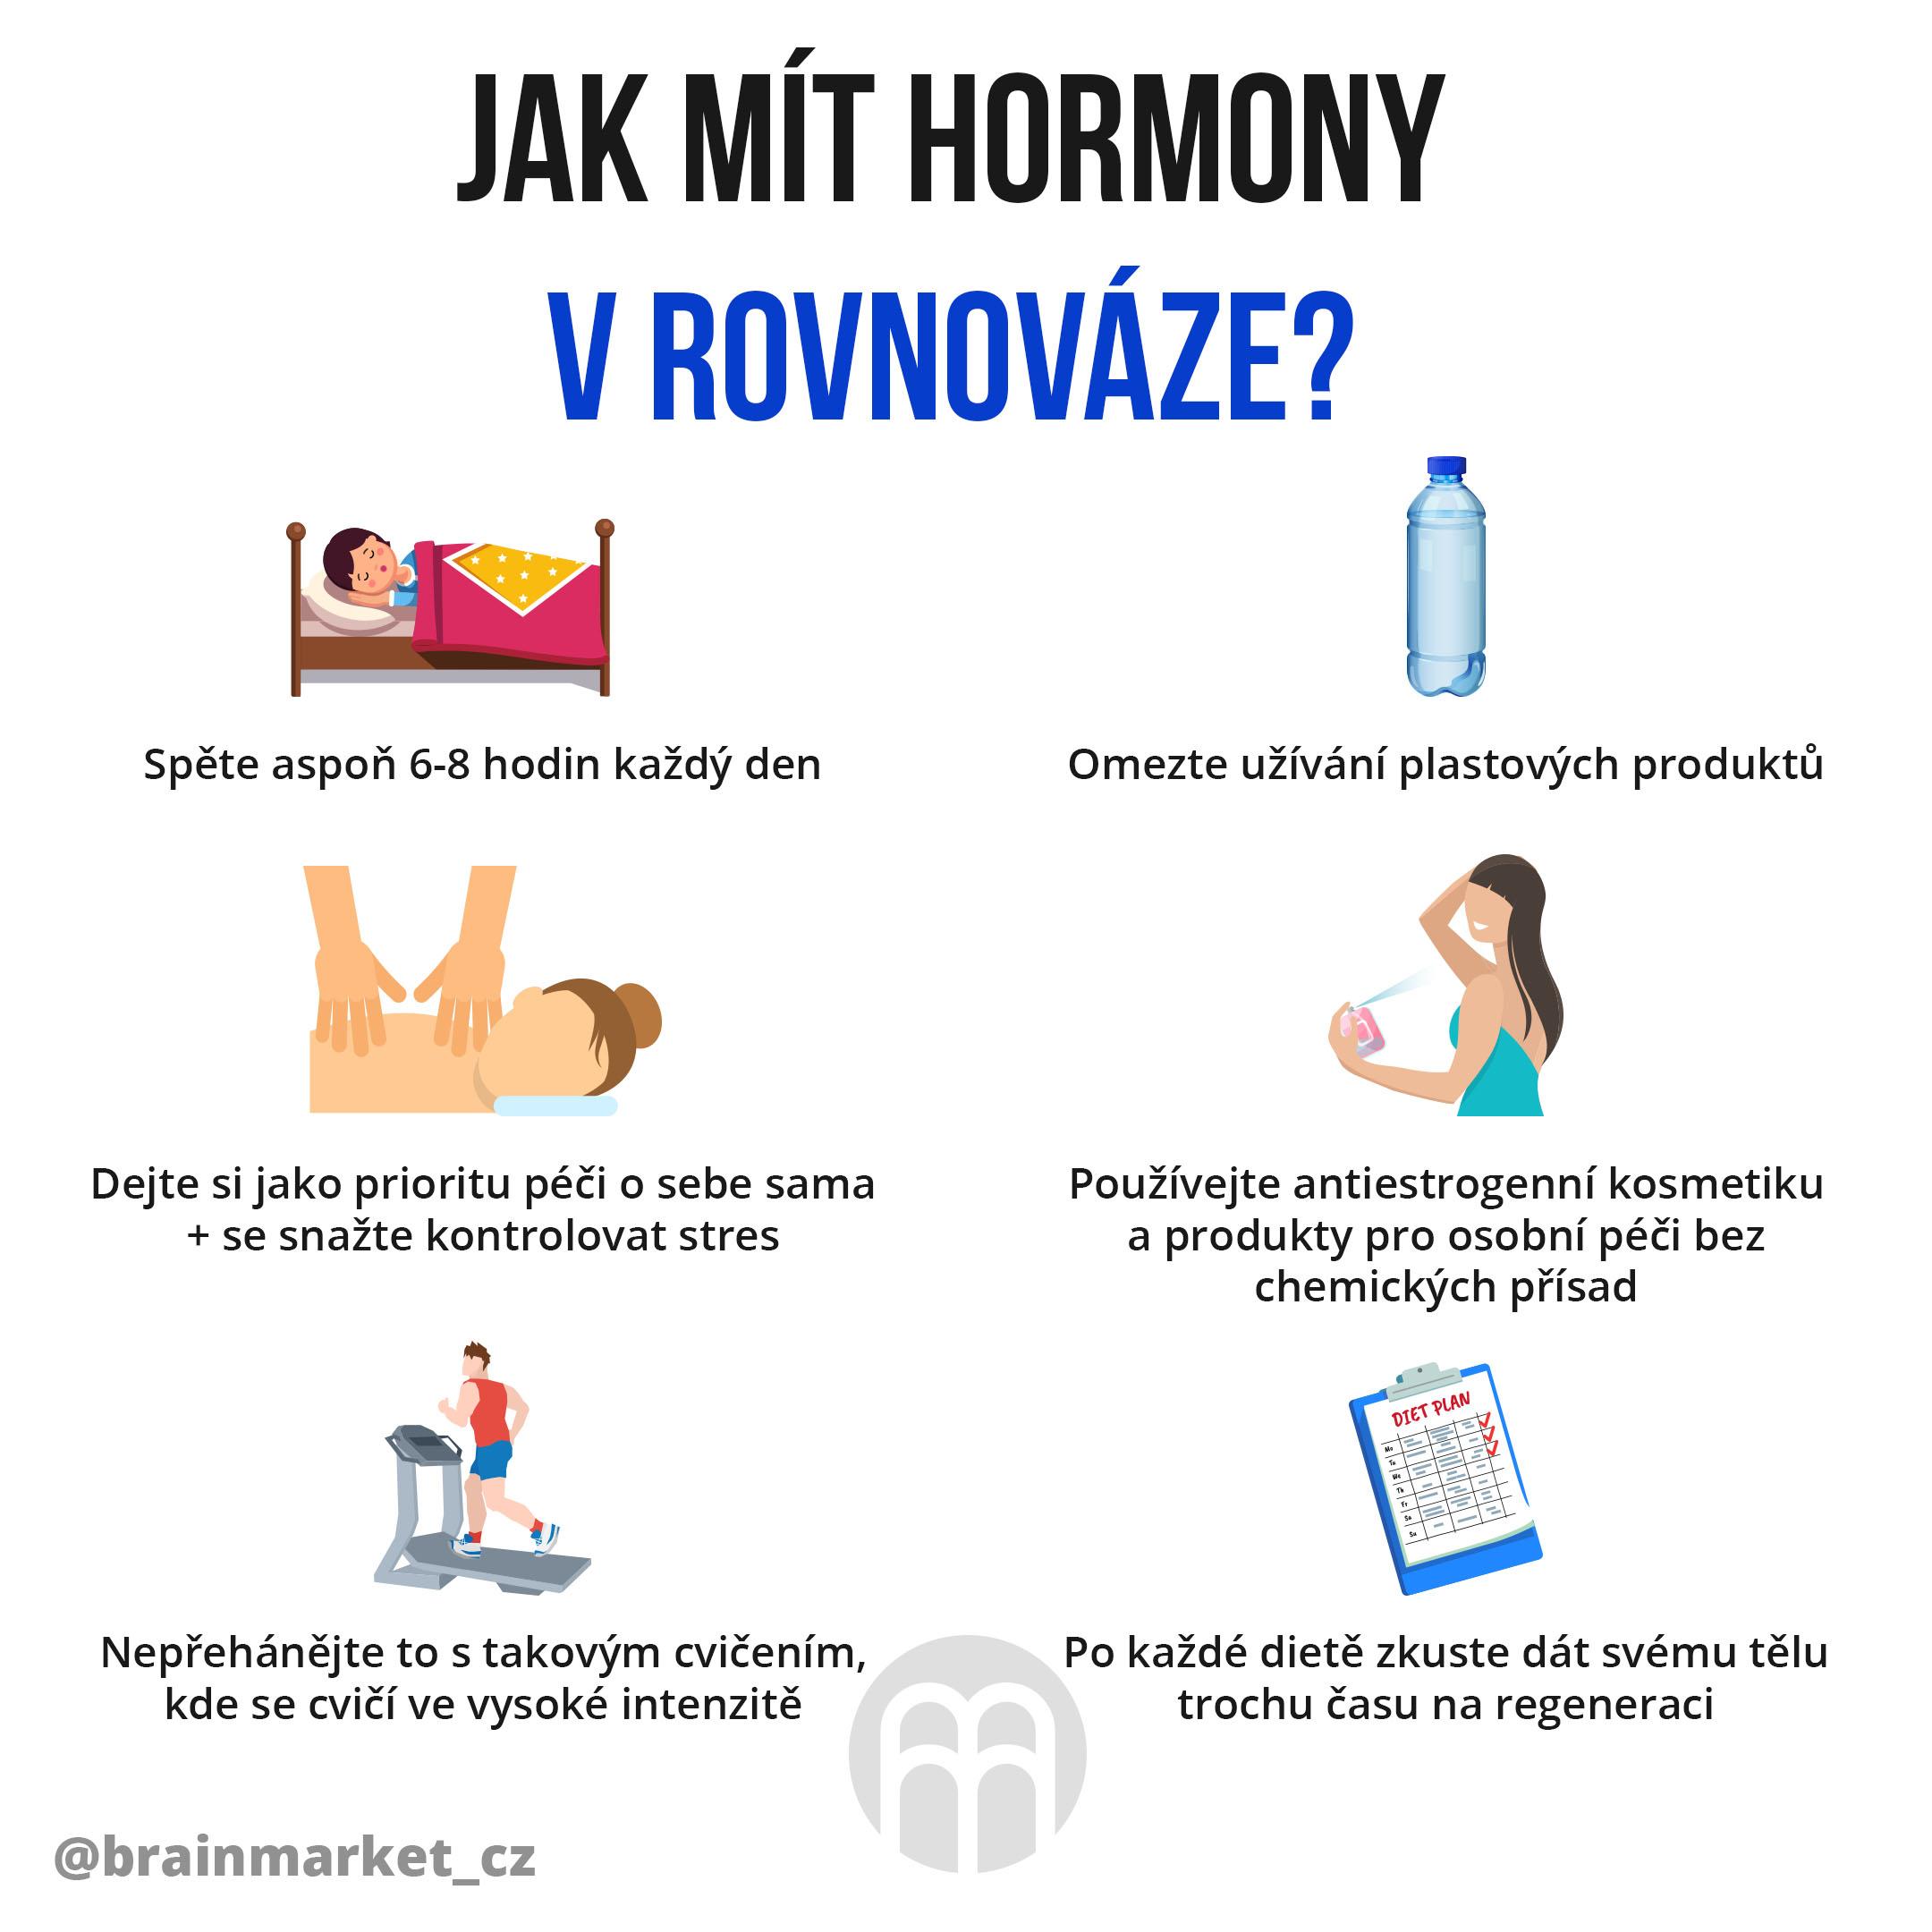 jak-mit-hormony-v-rovnovaze